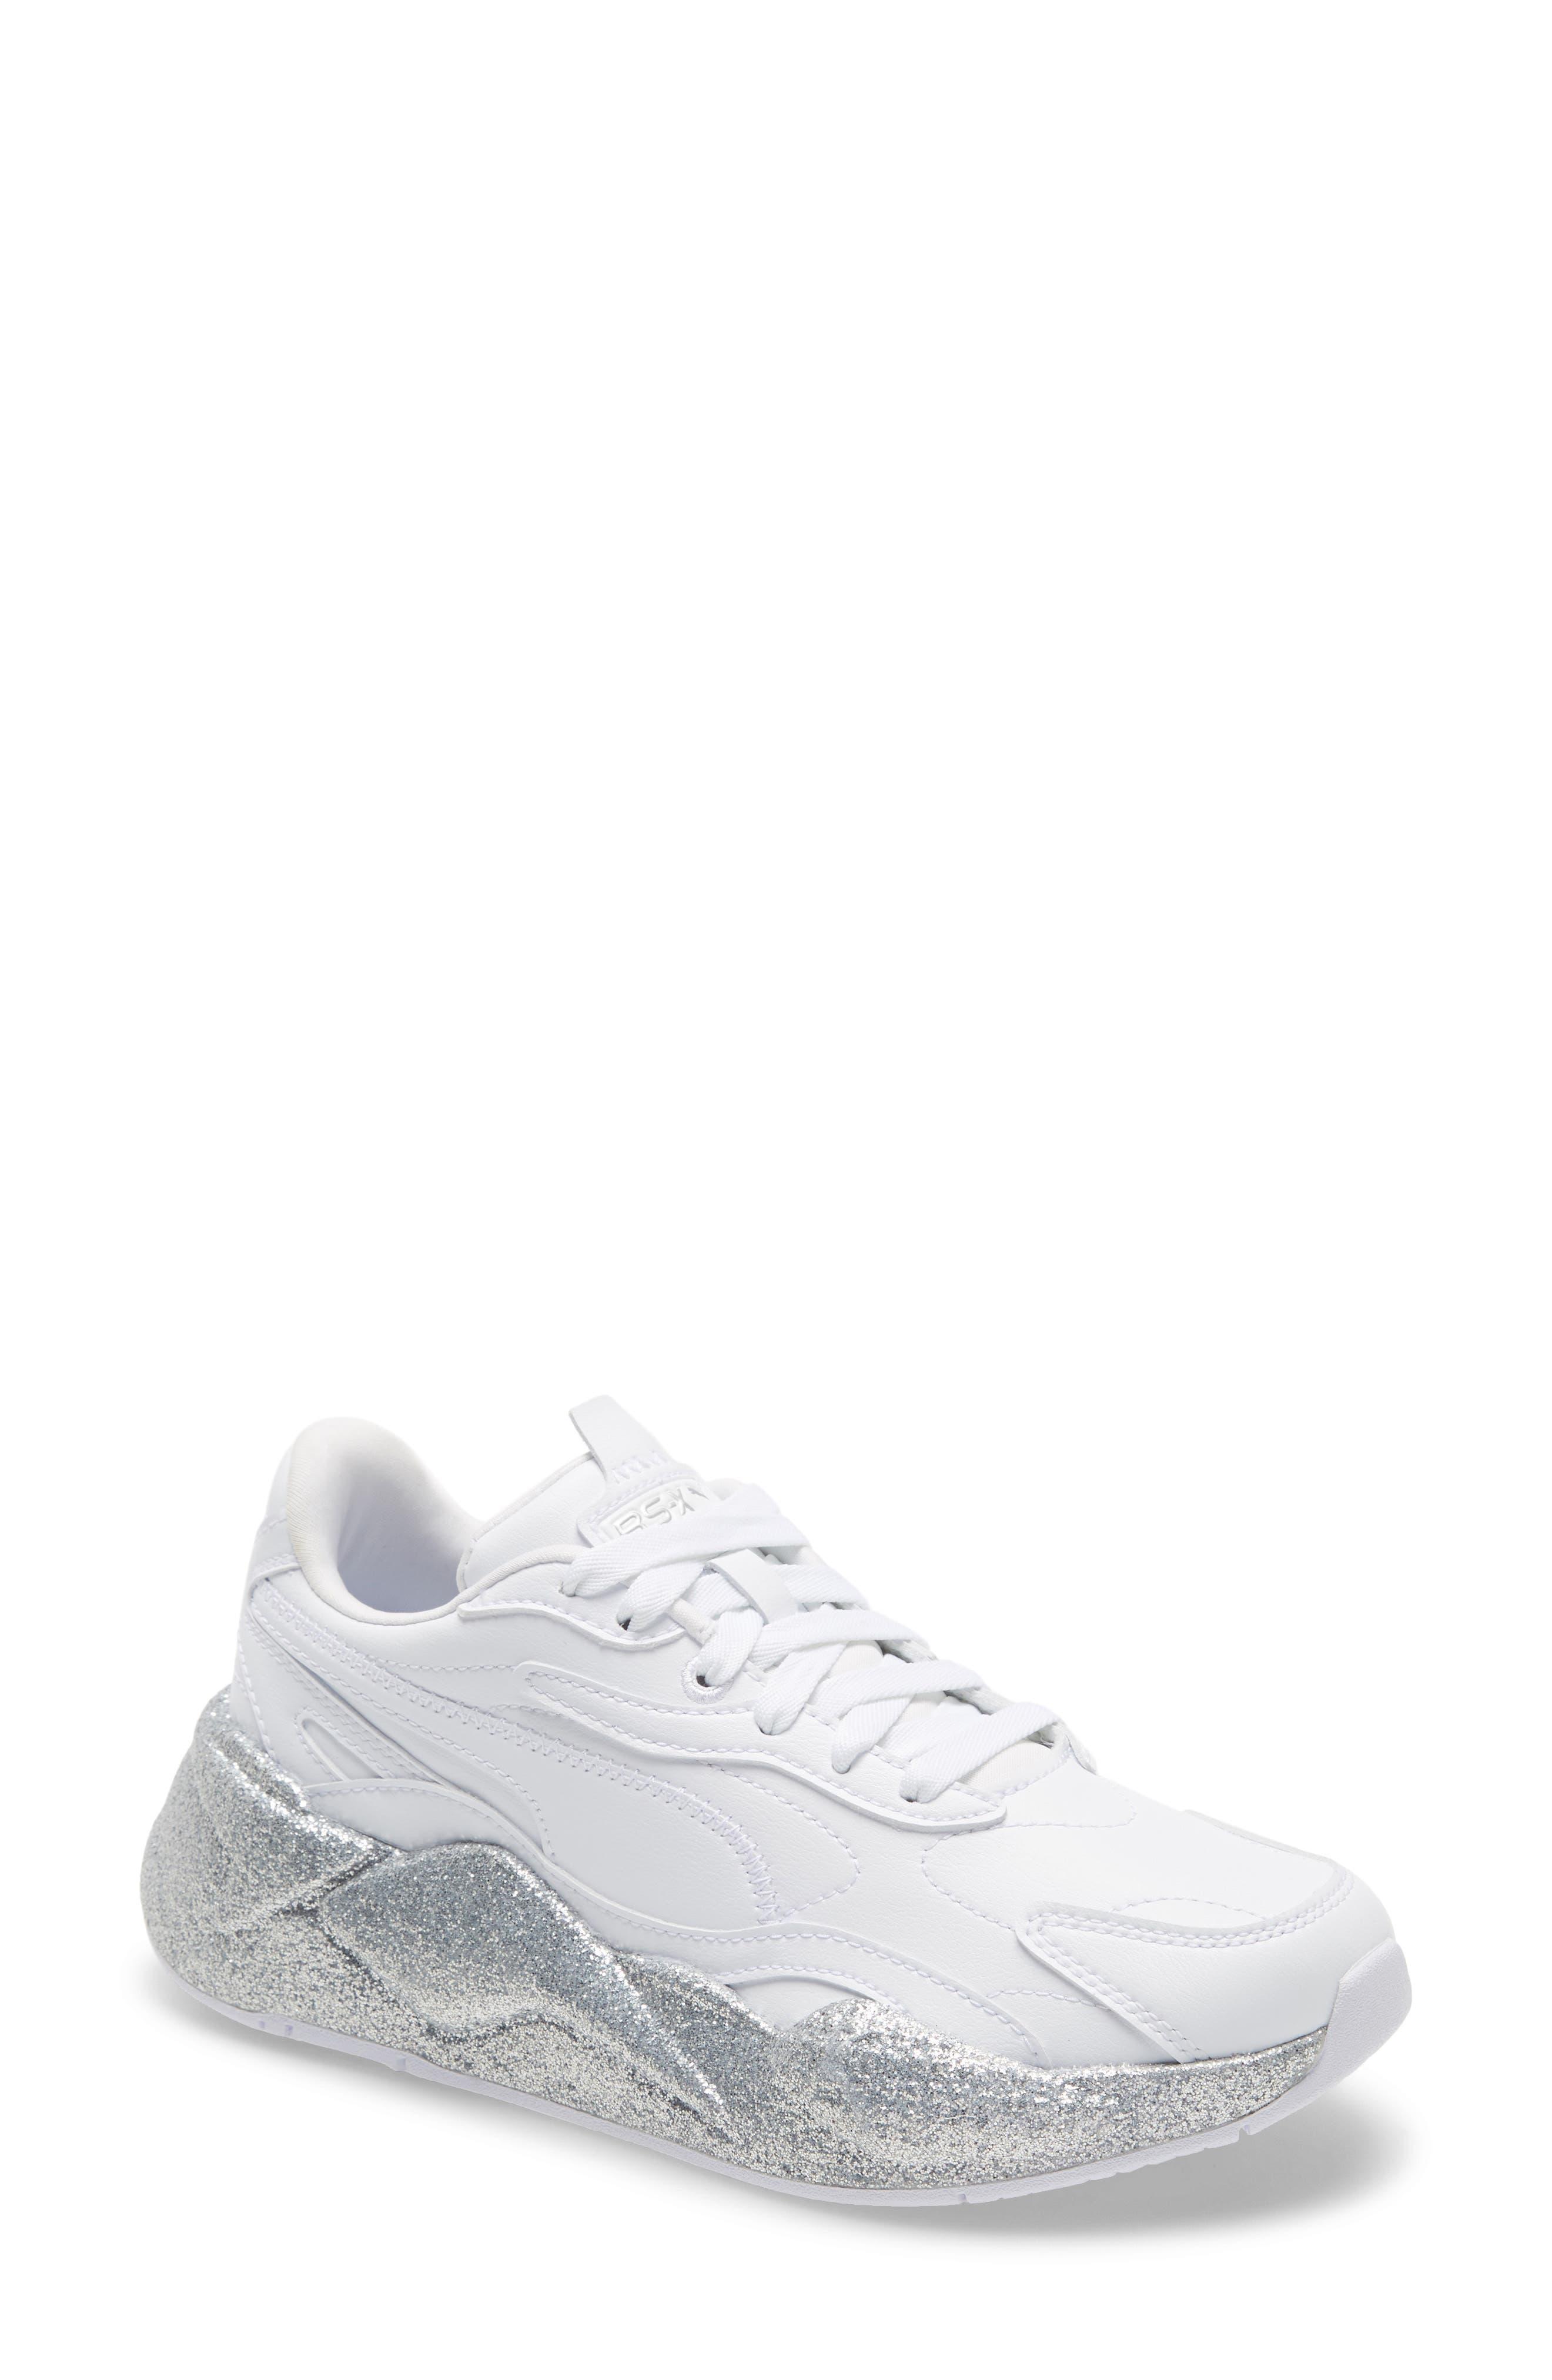 PUMA RS-X Glitz Sneaker (Women)   Nordstrom